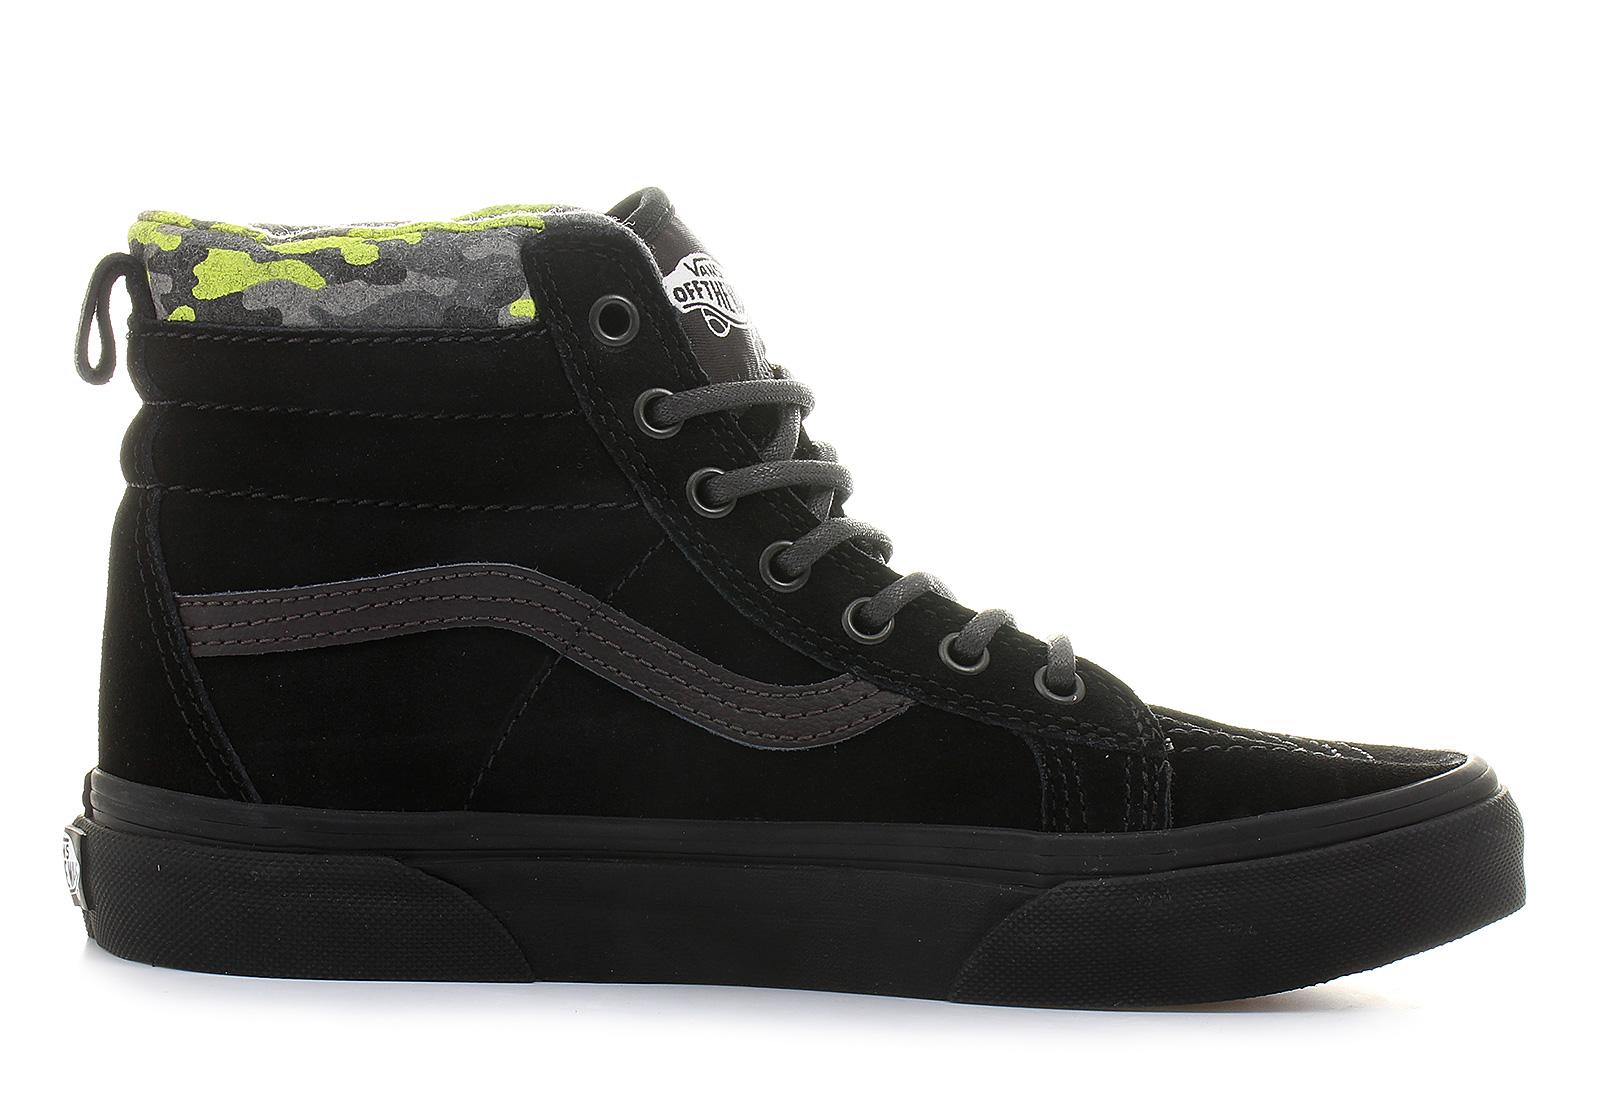 78da03edfe Vans Sneakers - Sk8-hi Mte K - VA2XSNK5L - Online shop for sneakers ...